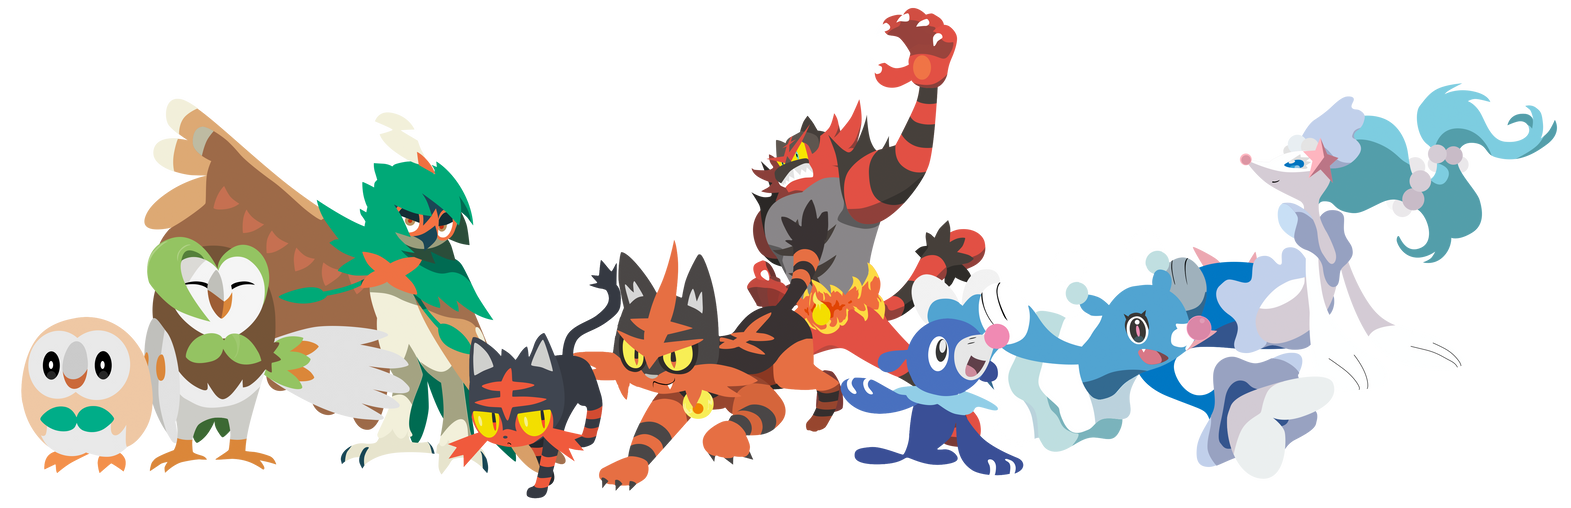 all starter pokemon in sun and moon